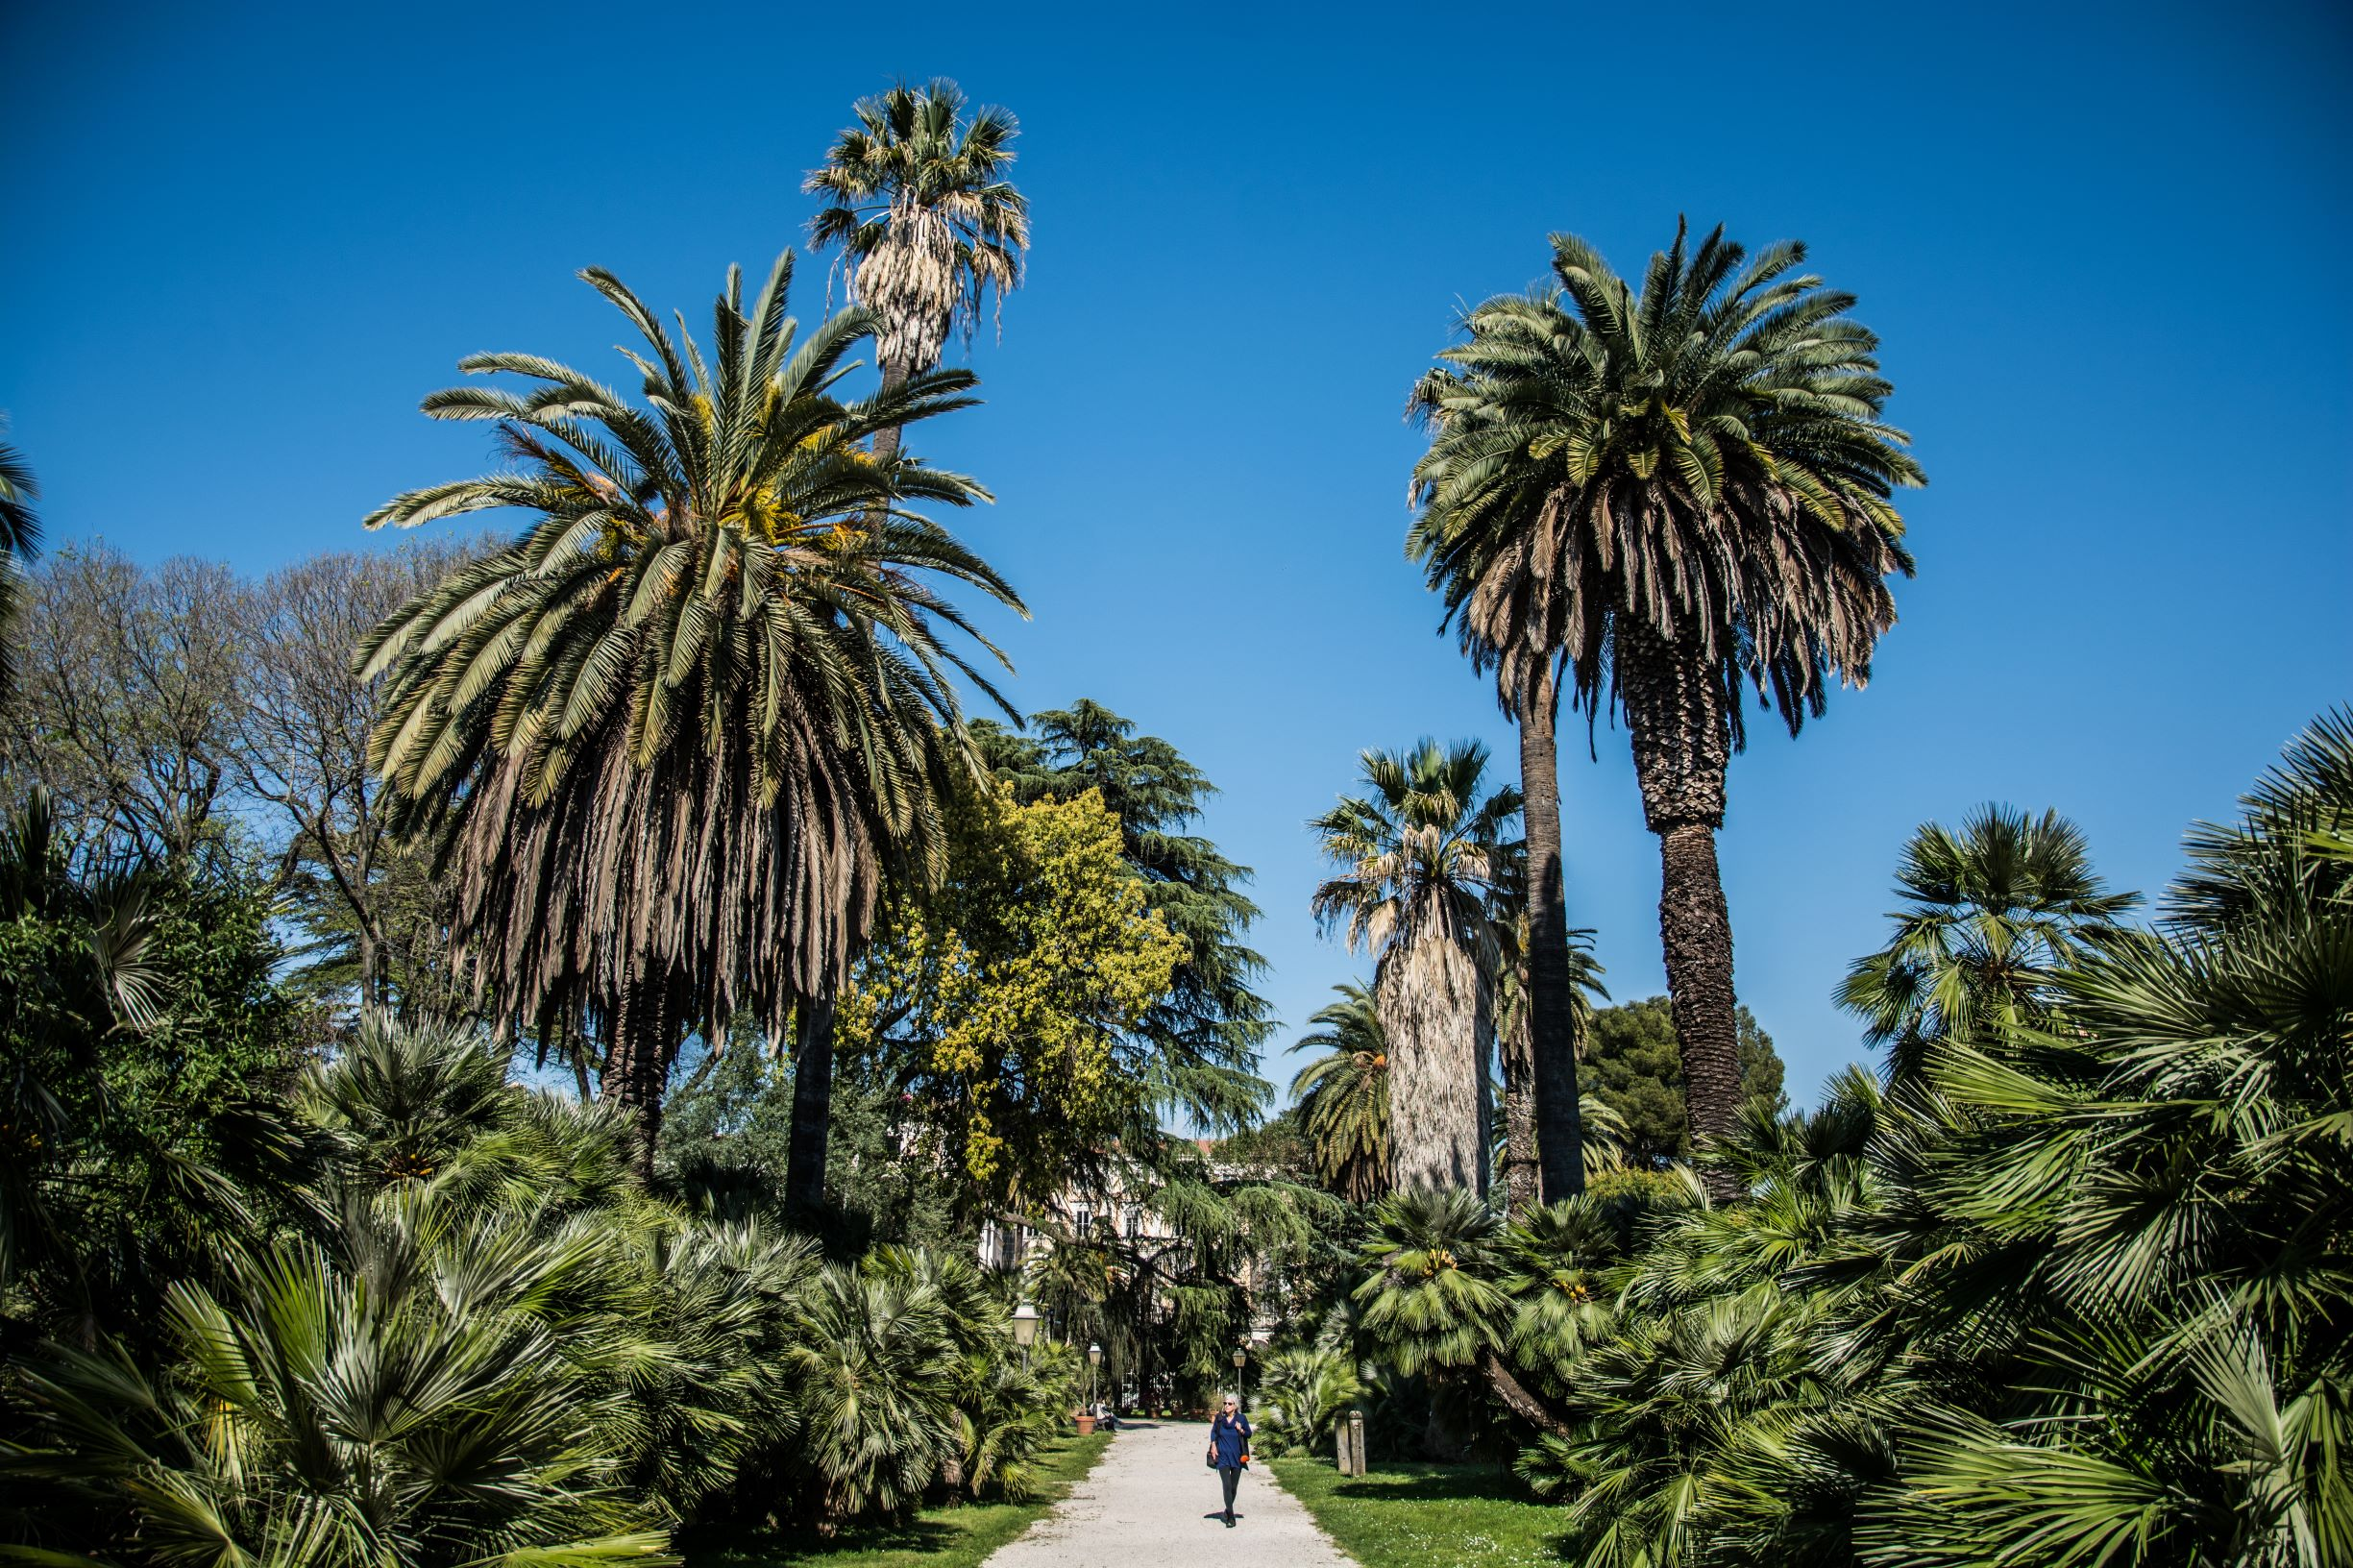 viale delle palme botanical gardens Rome